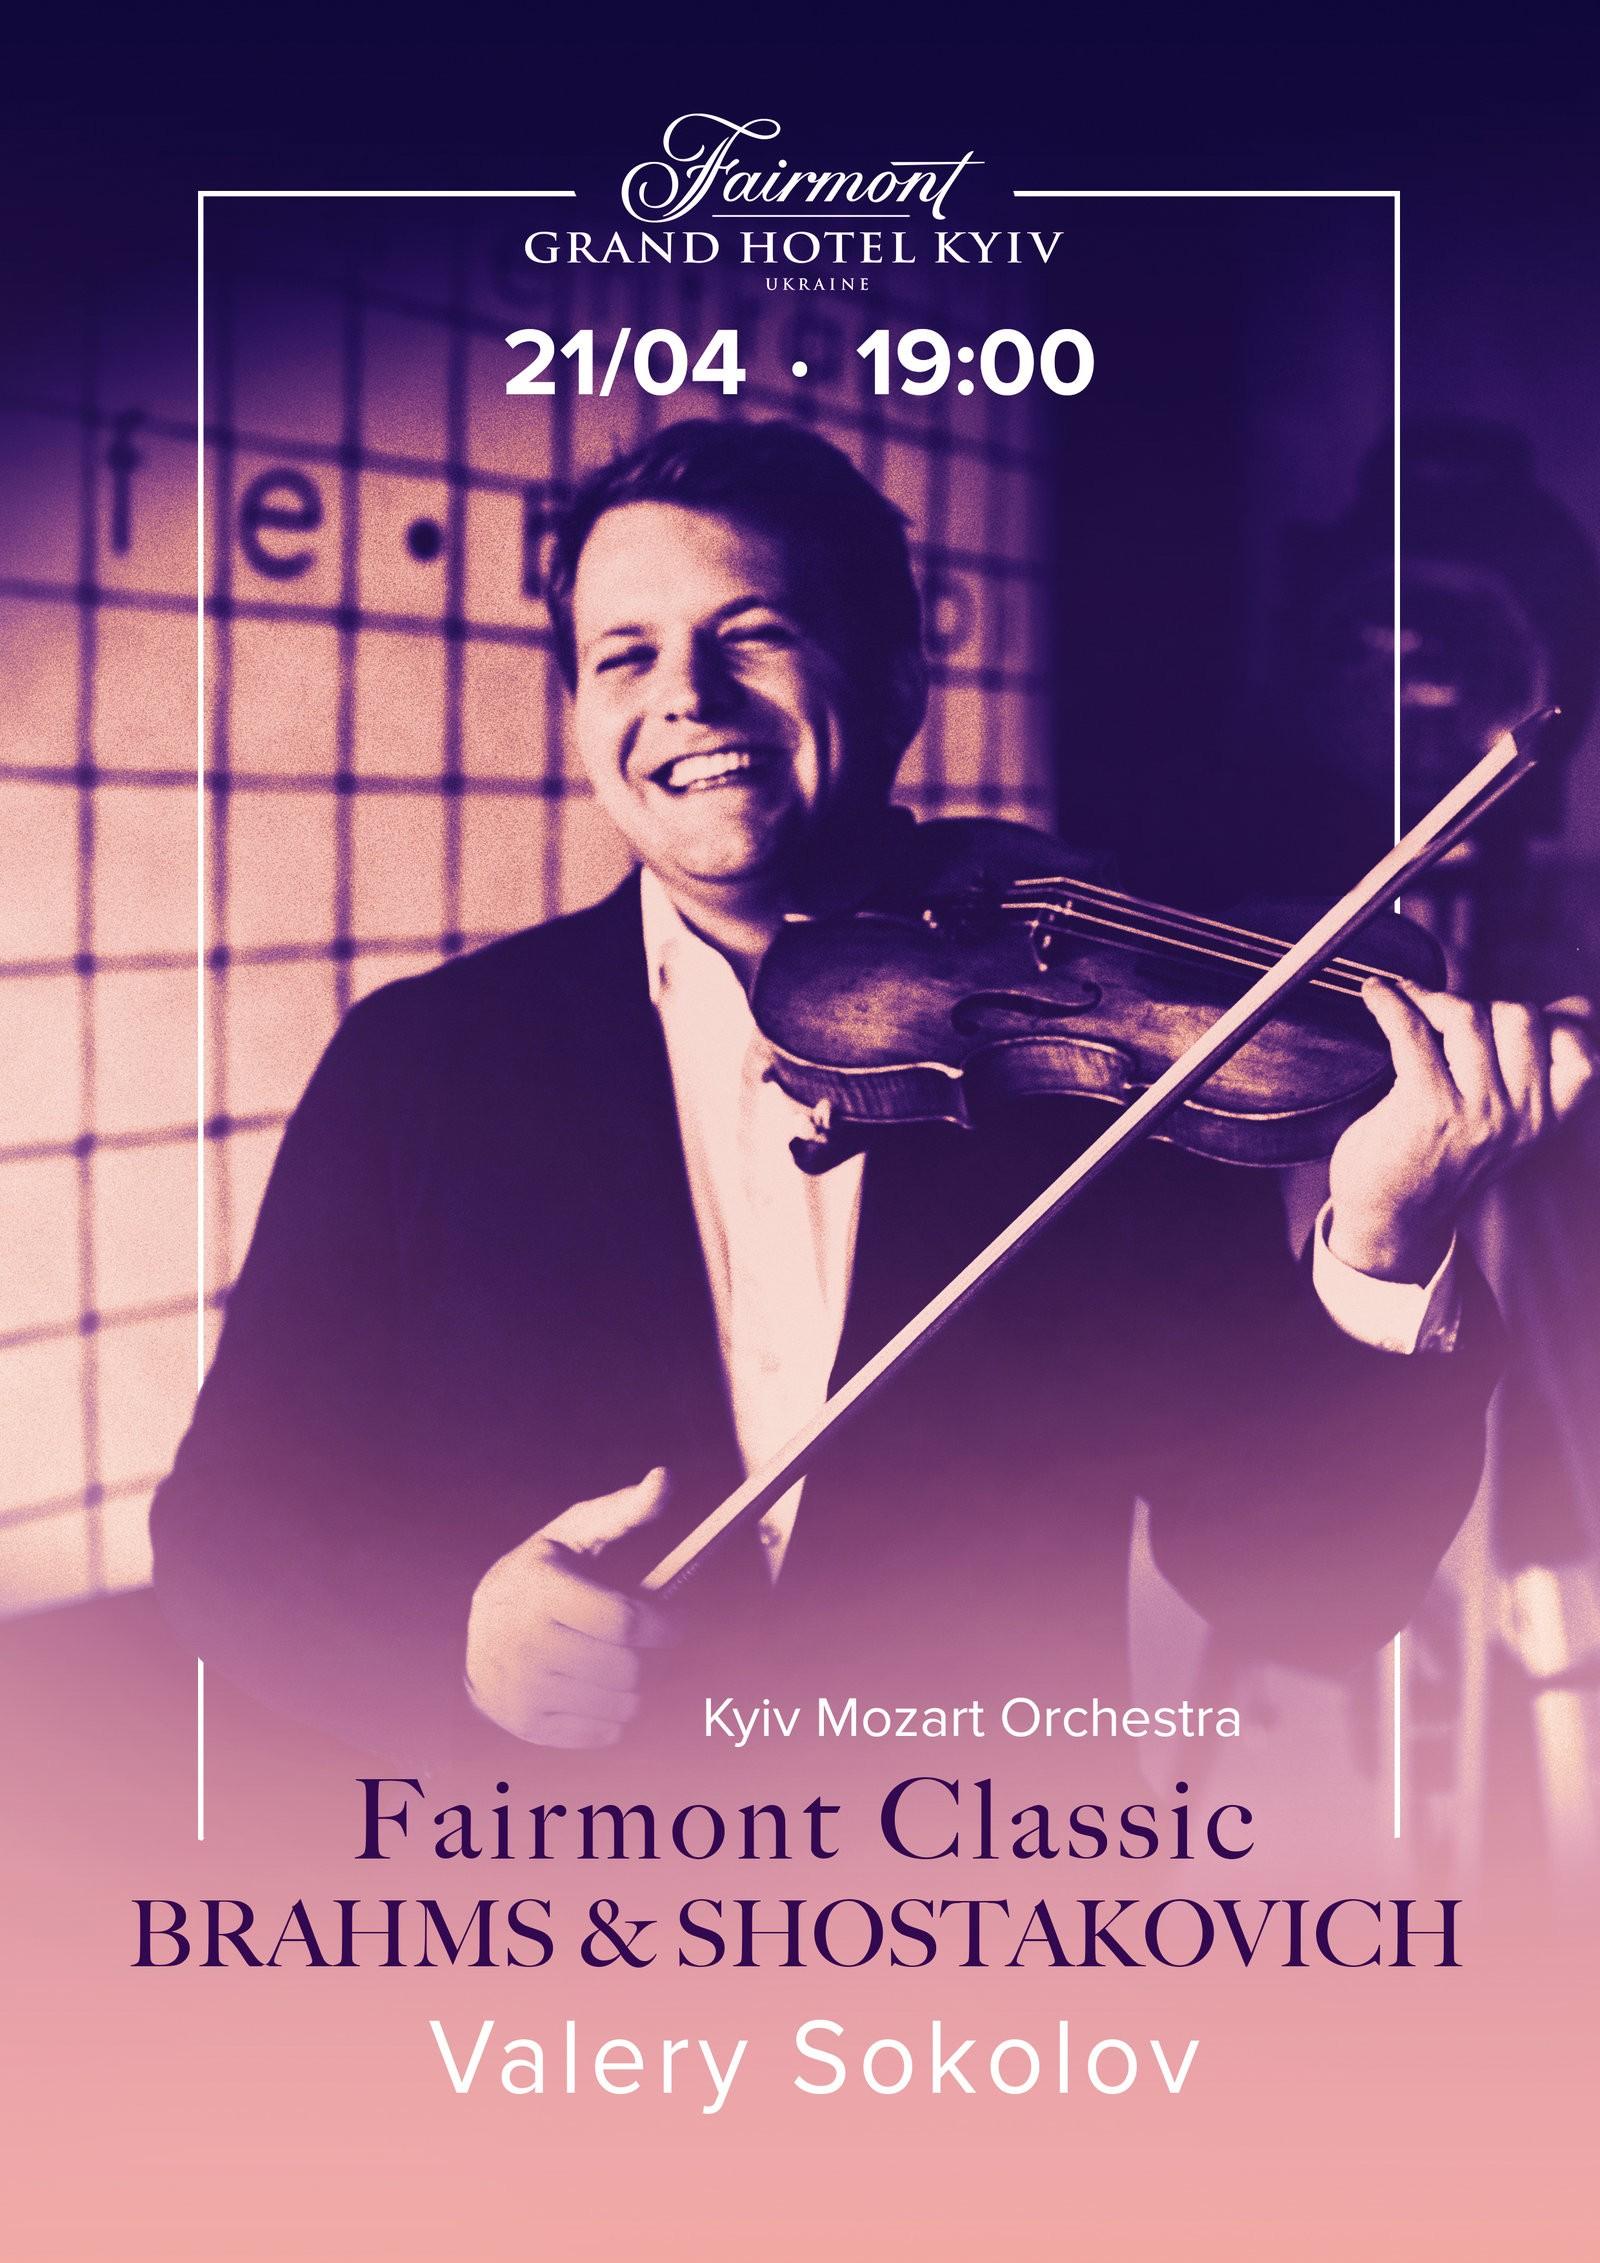 Билеты Fairmont Classic - Brahms & Shostakovich